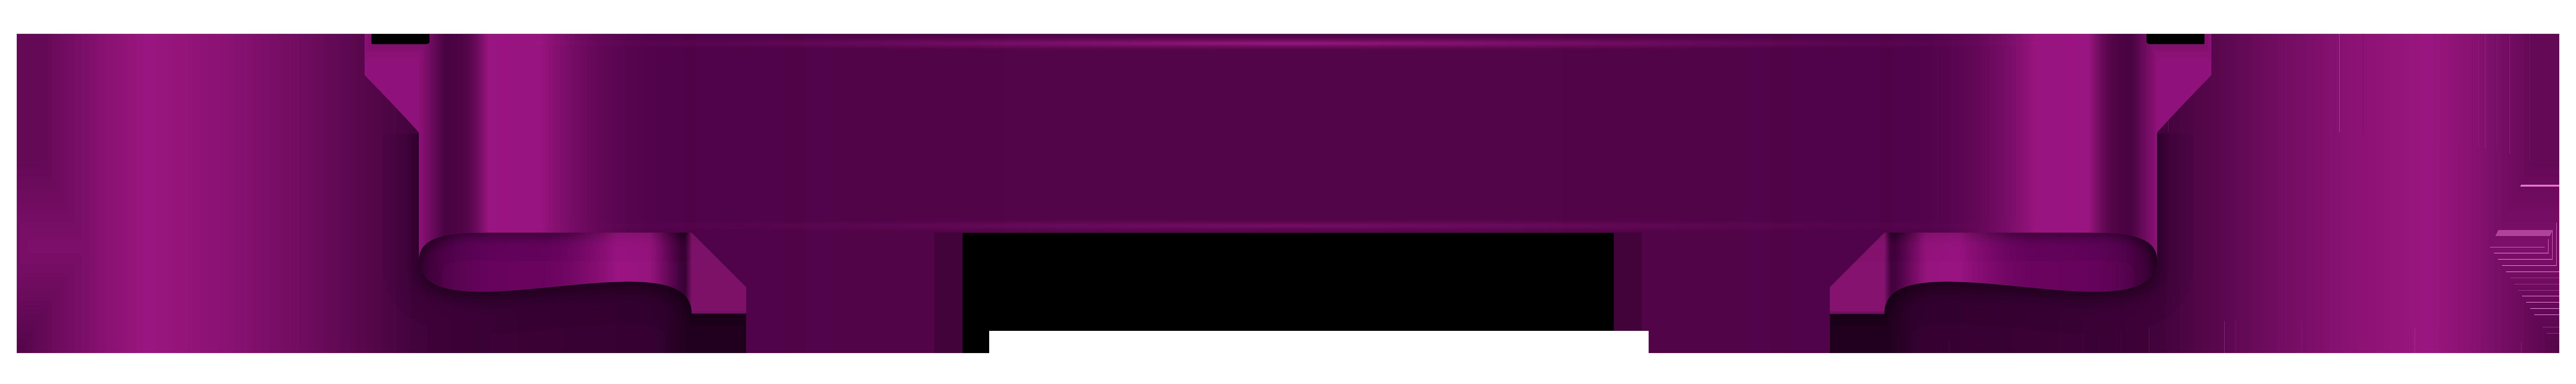 Purple Banner Transparent Png Clip Art Clip Art Banner Free Clip Art